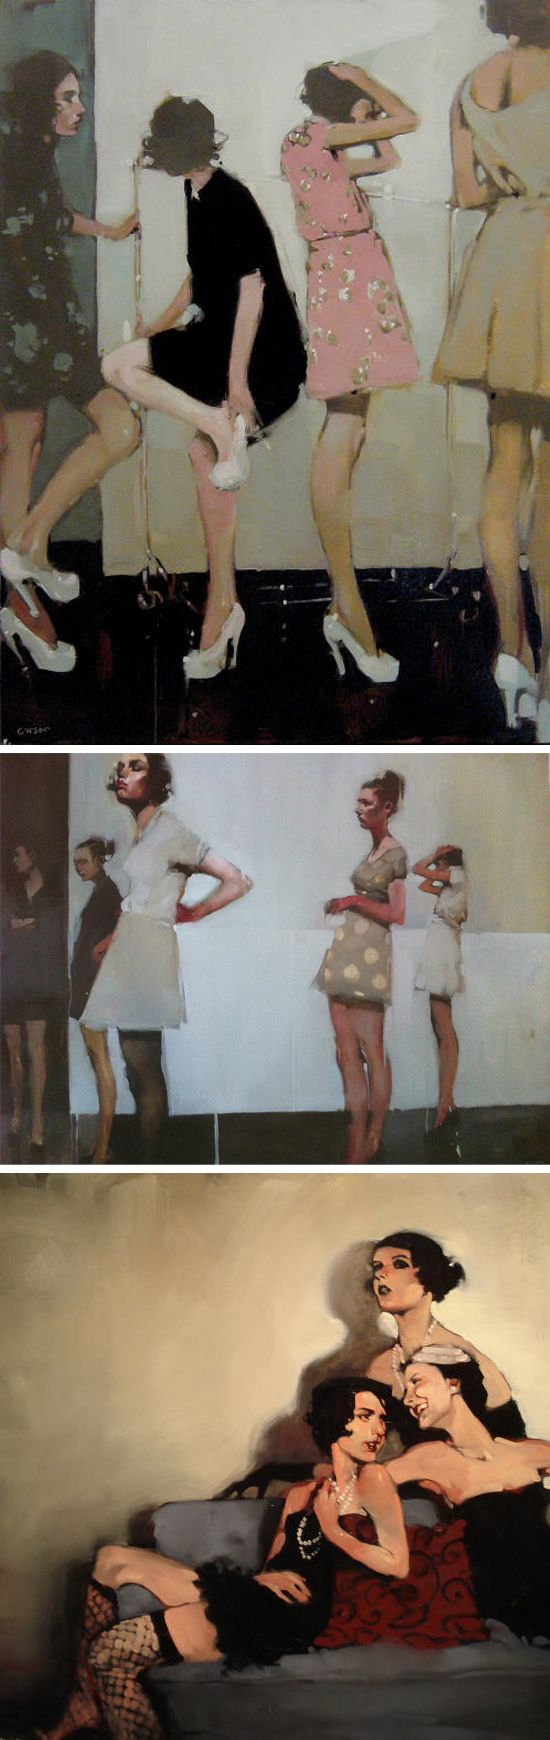 ART THAT'S INSPIRING | michael carson, painter